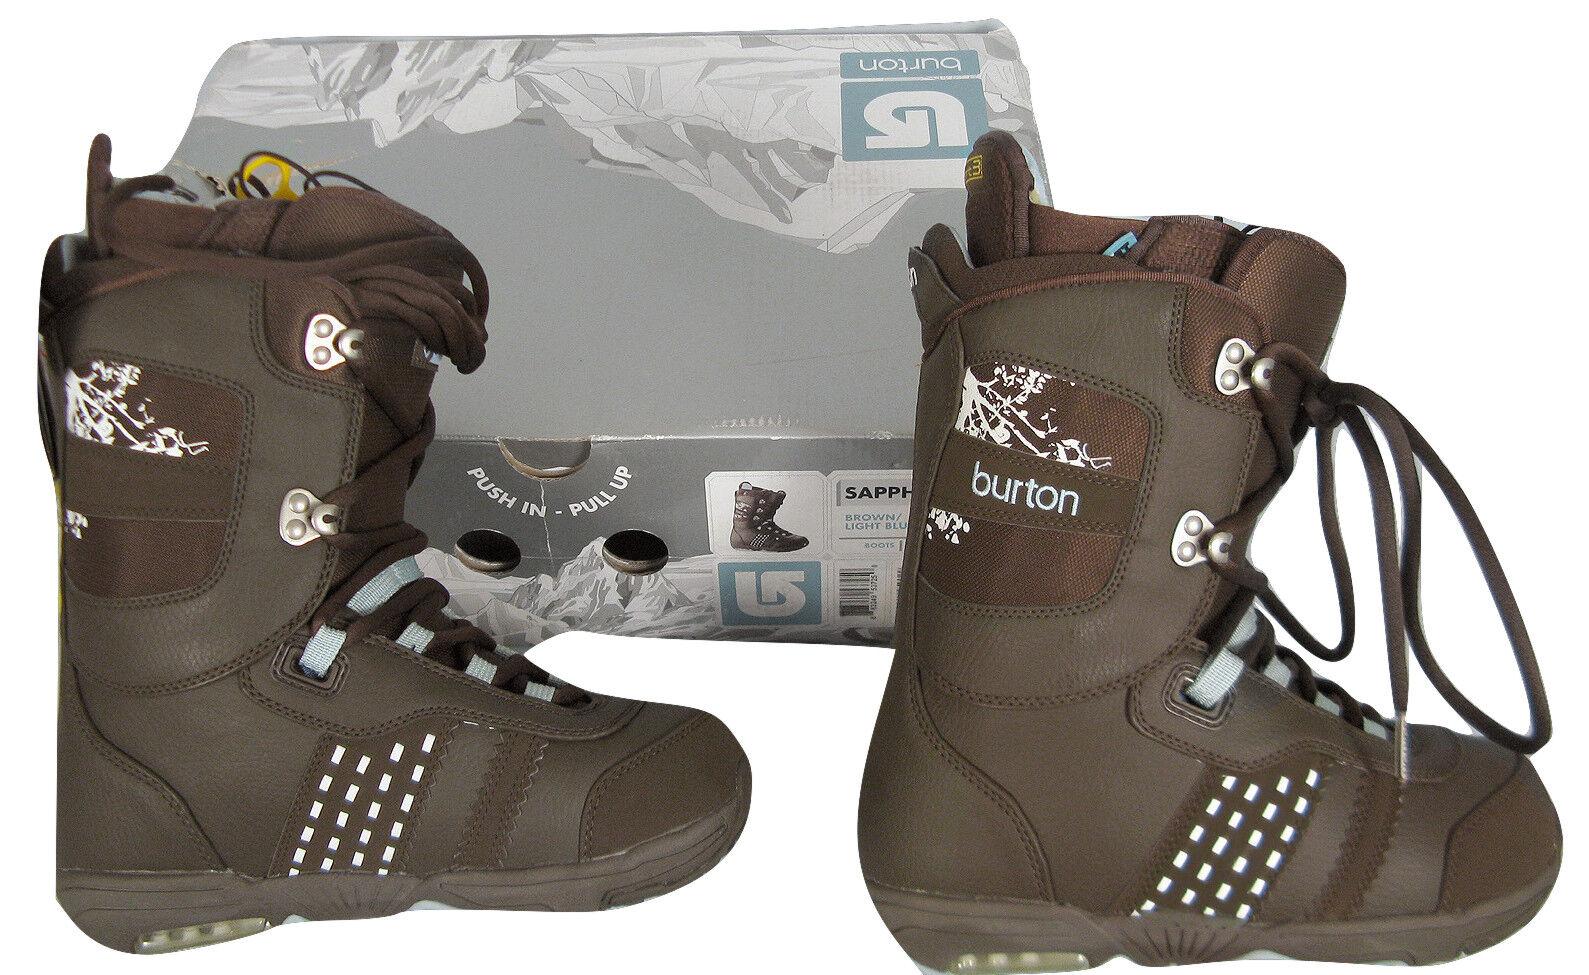 NEW Burton Sapphire Snowboard Stiefel   US 4 UK 2.5 Euro 34 Mondo 21  braun